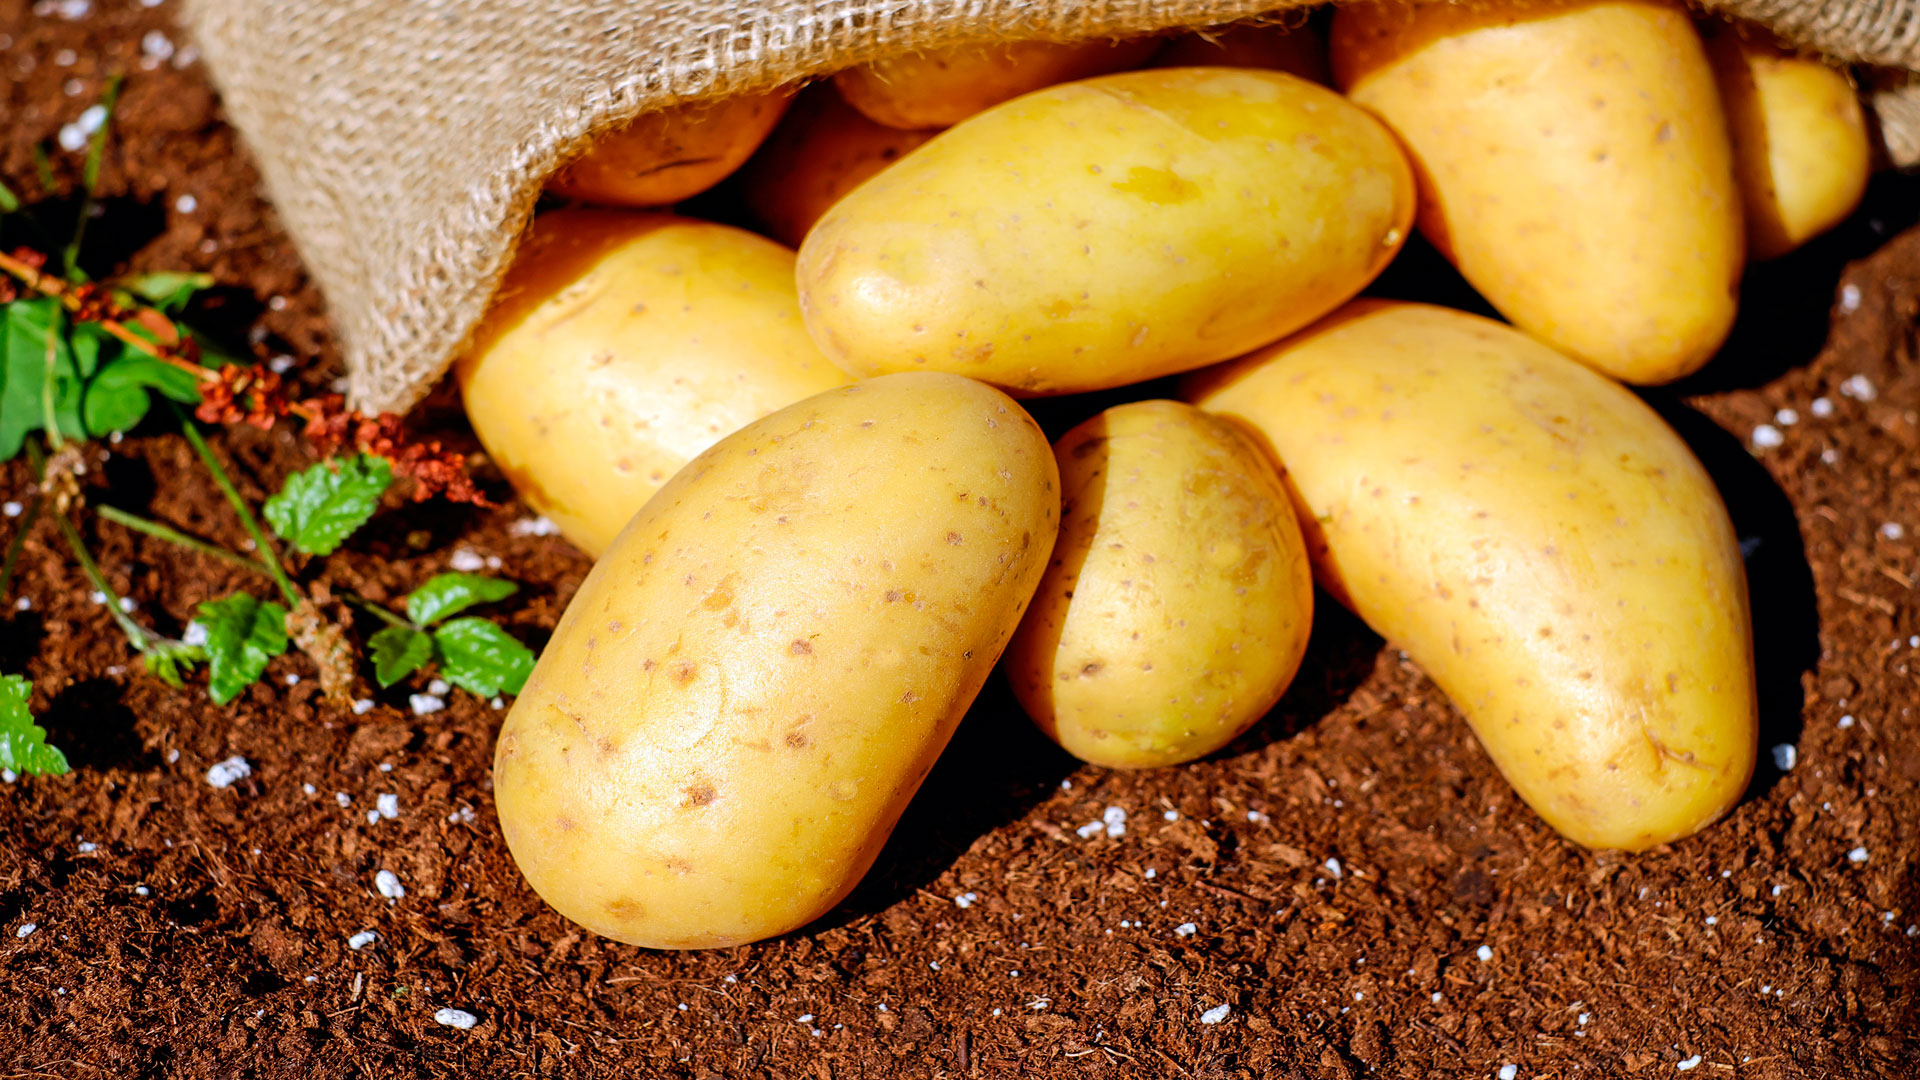 Una patata gallega a la conquista del mercado español